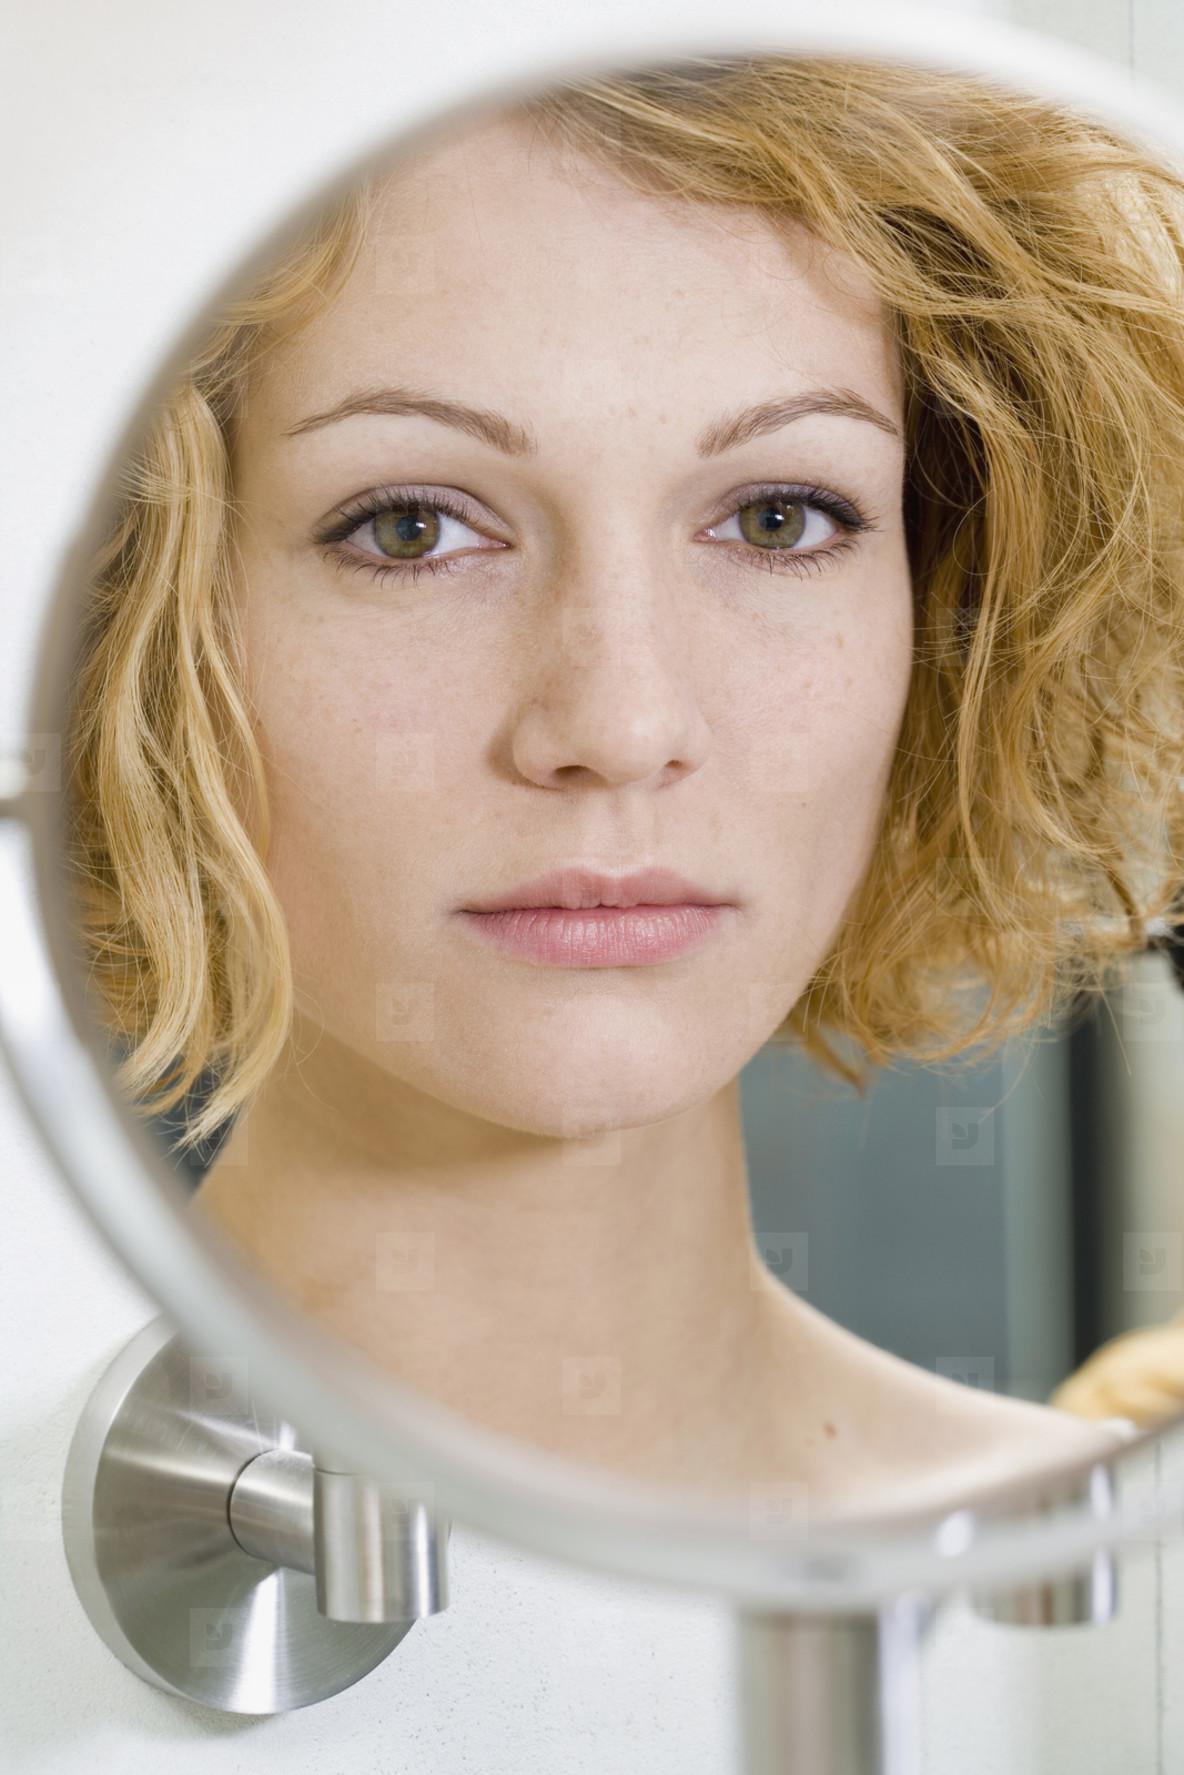 Beauty Day Portraits  14